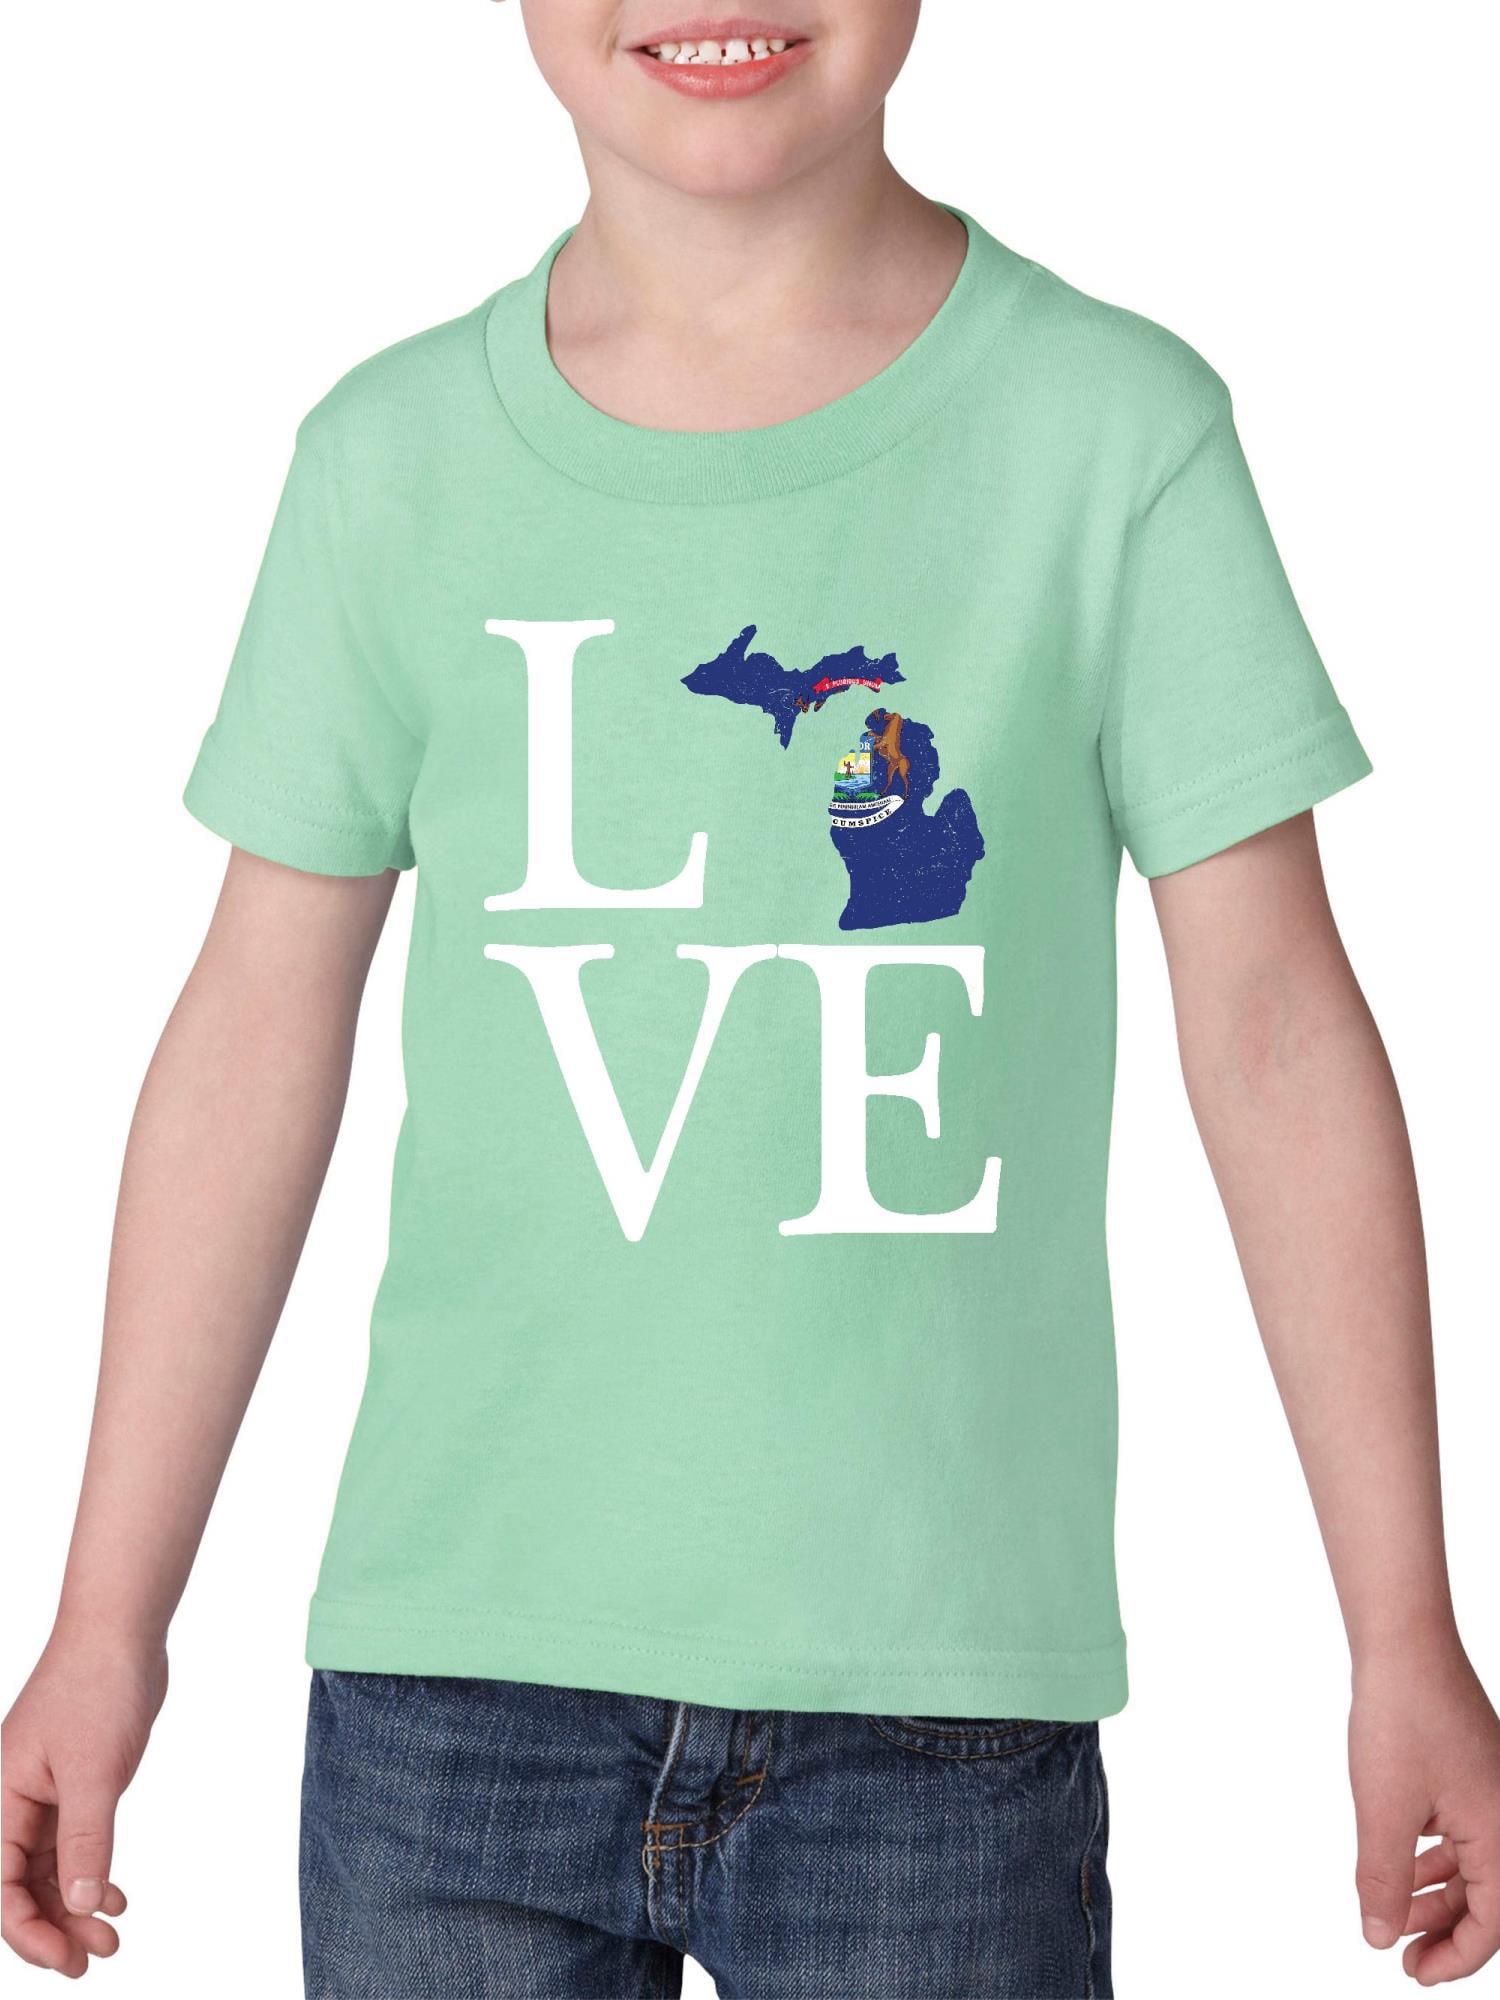 Love Michigan Heavy Cotton Toddler Kids T-Shirt Tee Clothing